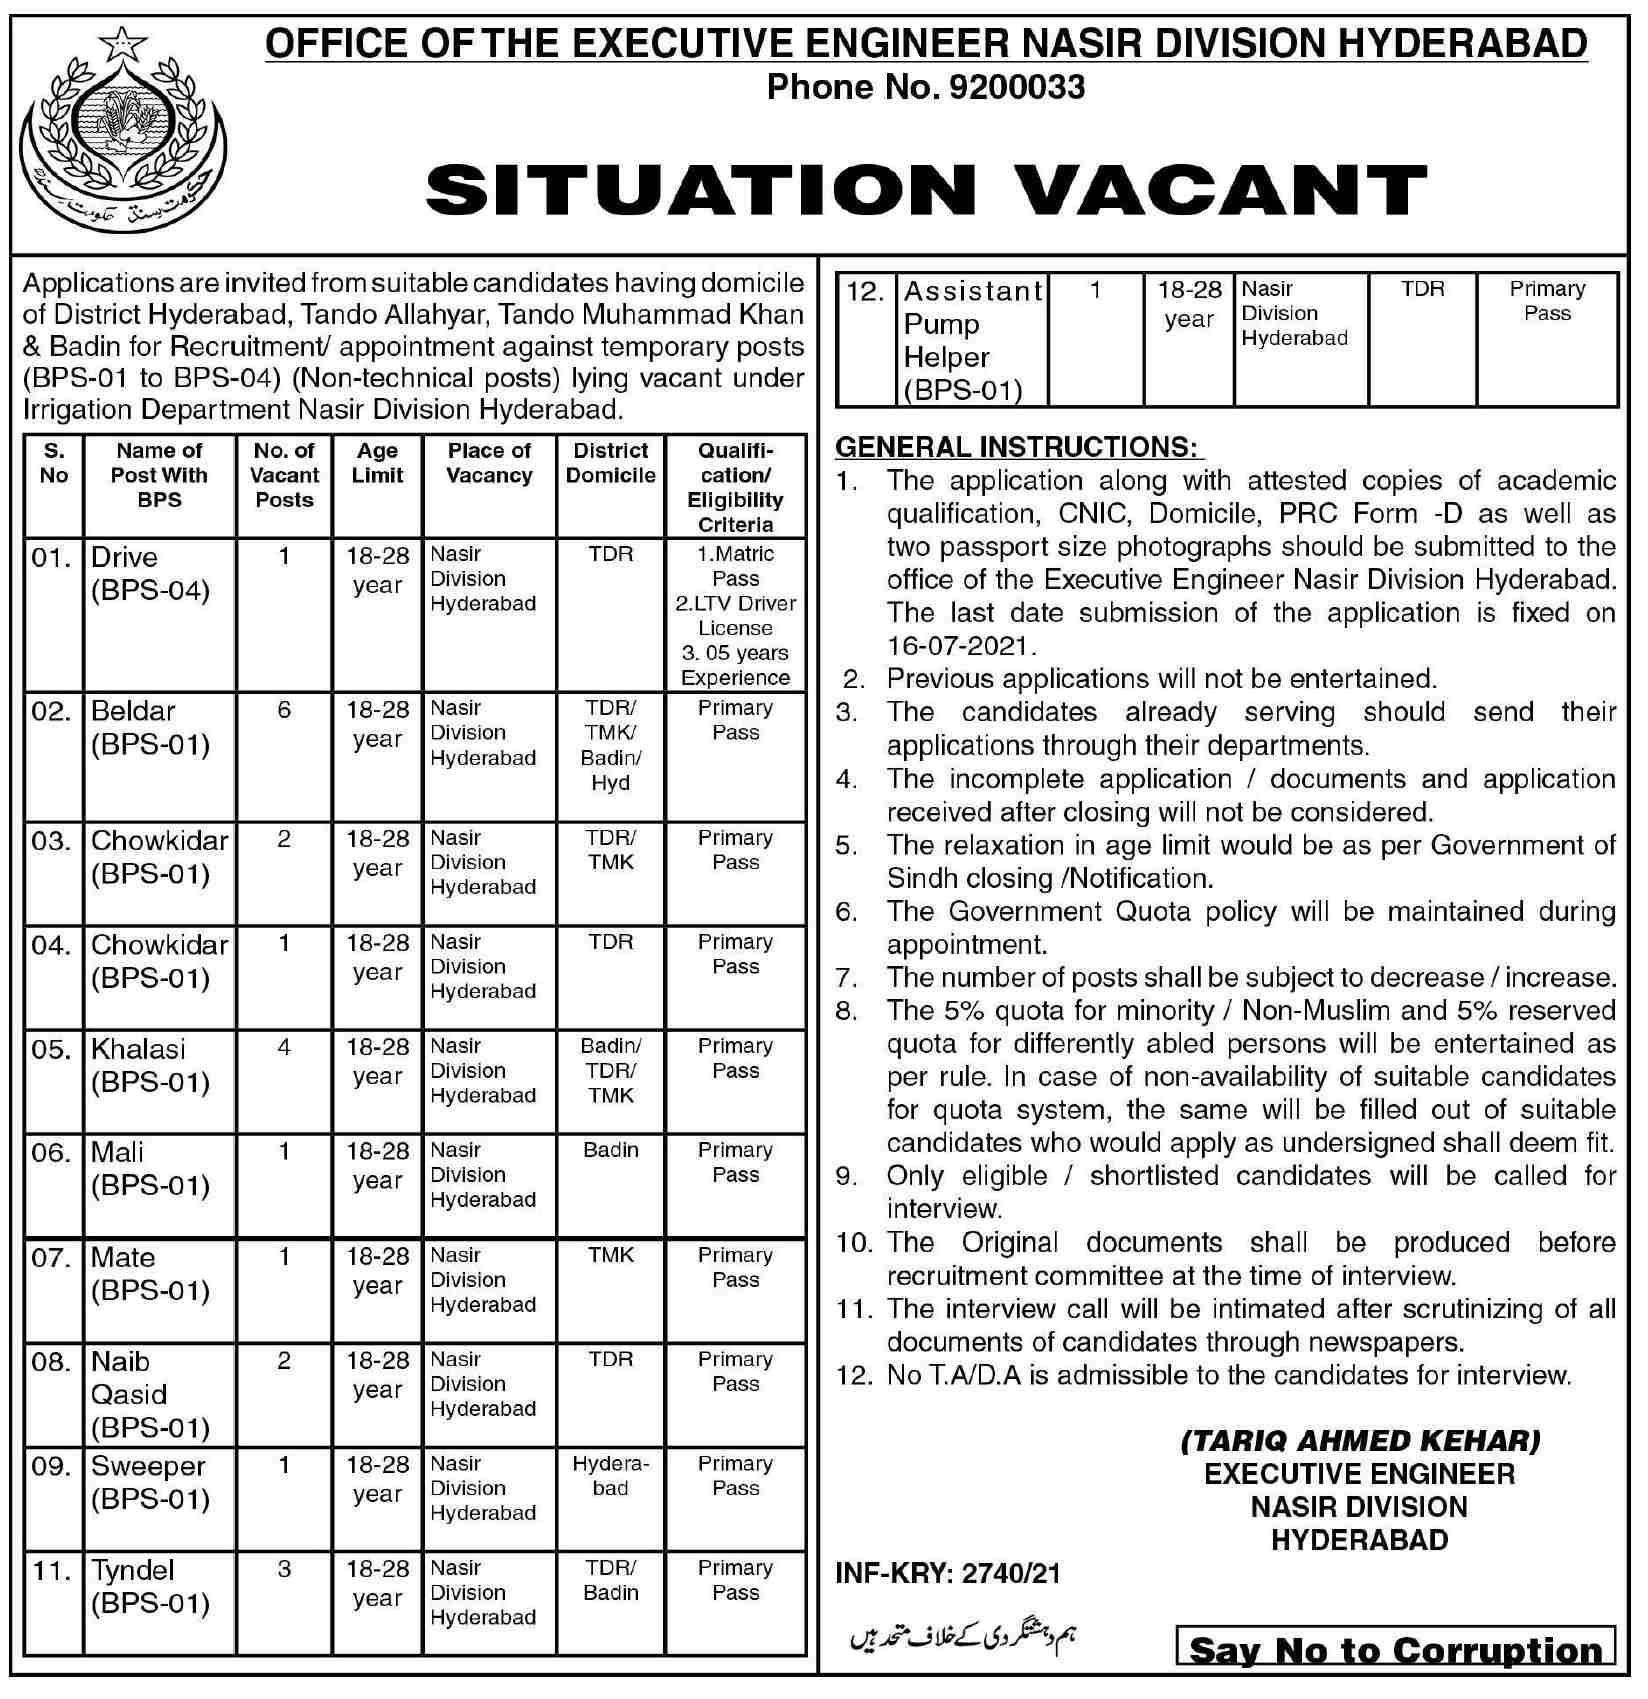 Executive Engineer Office NASIR Division Hyderabad Jobs 2021 in Pakistan